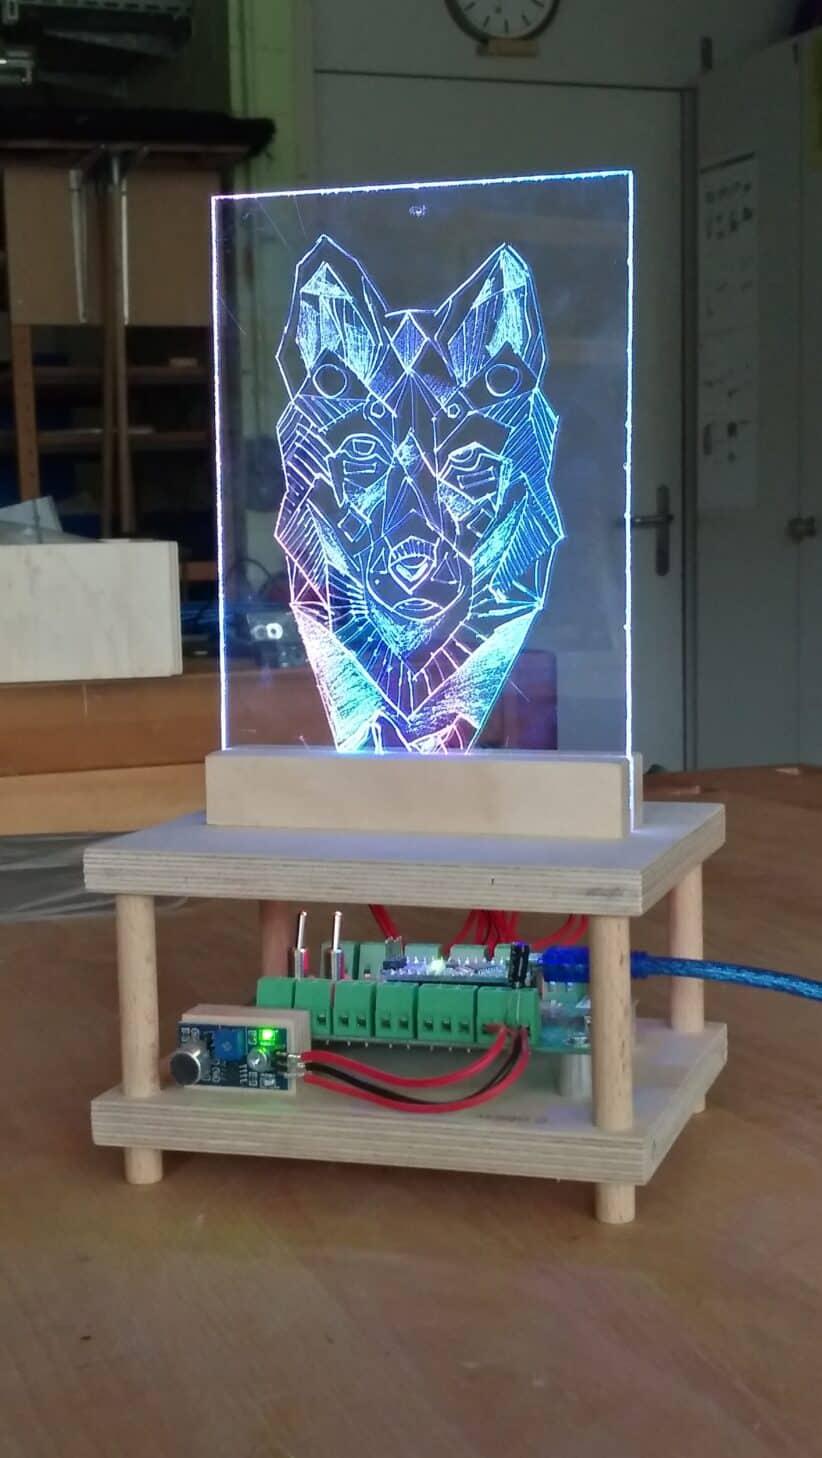 Acrylglasbild graviert mit LEDs